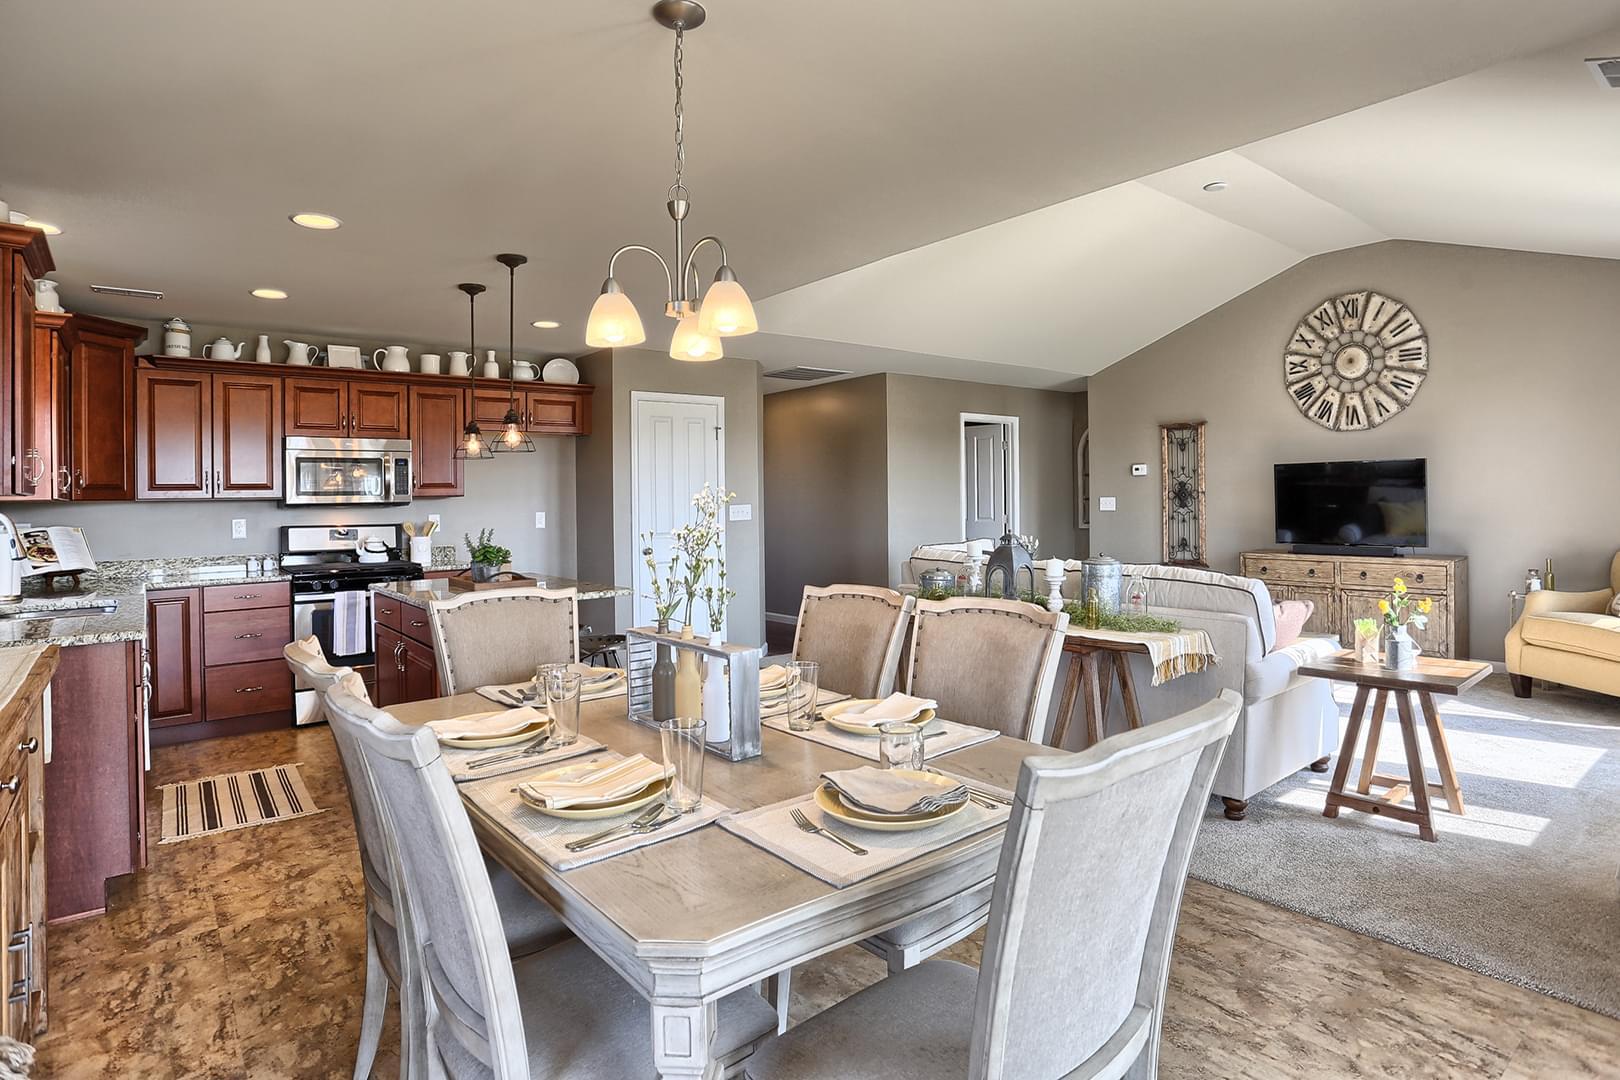 1,662sf New Home in Mechanicsburg, PA